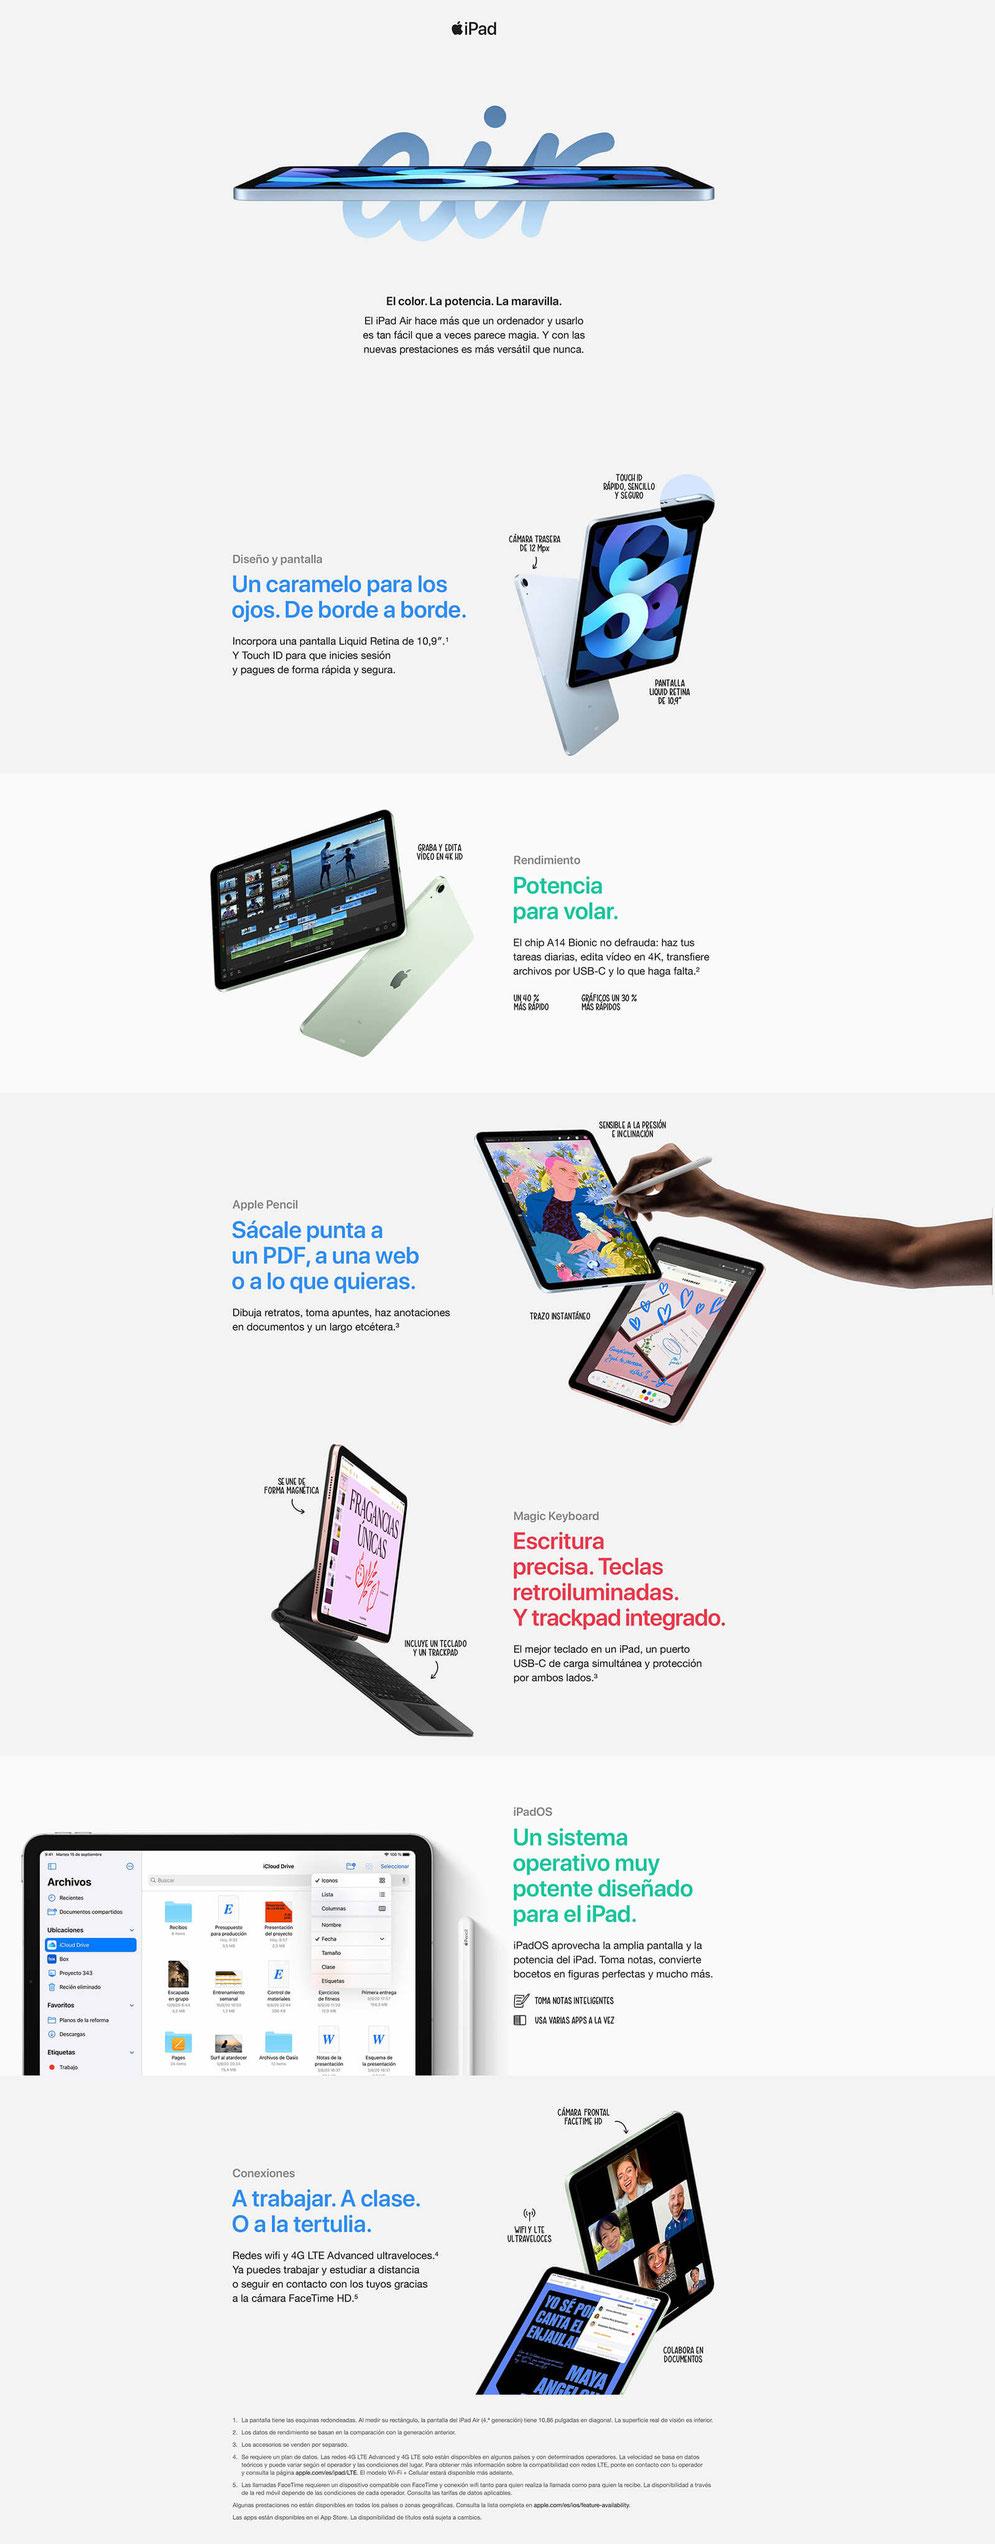 iPad Air 2020 de 256GB WiFi en Tenerife